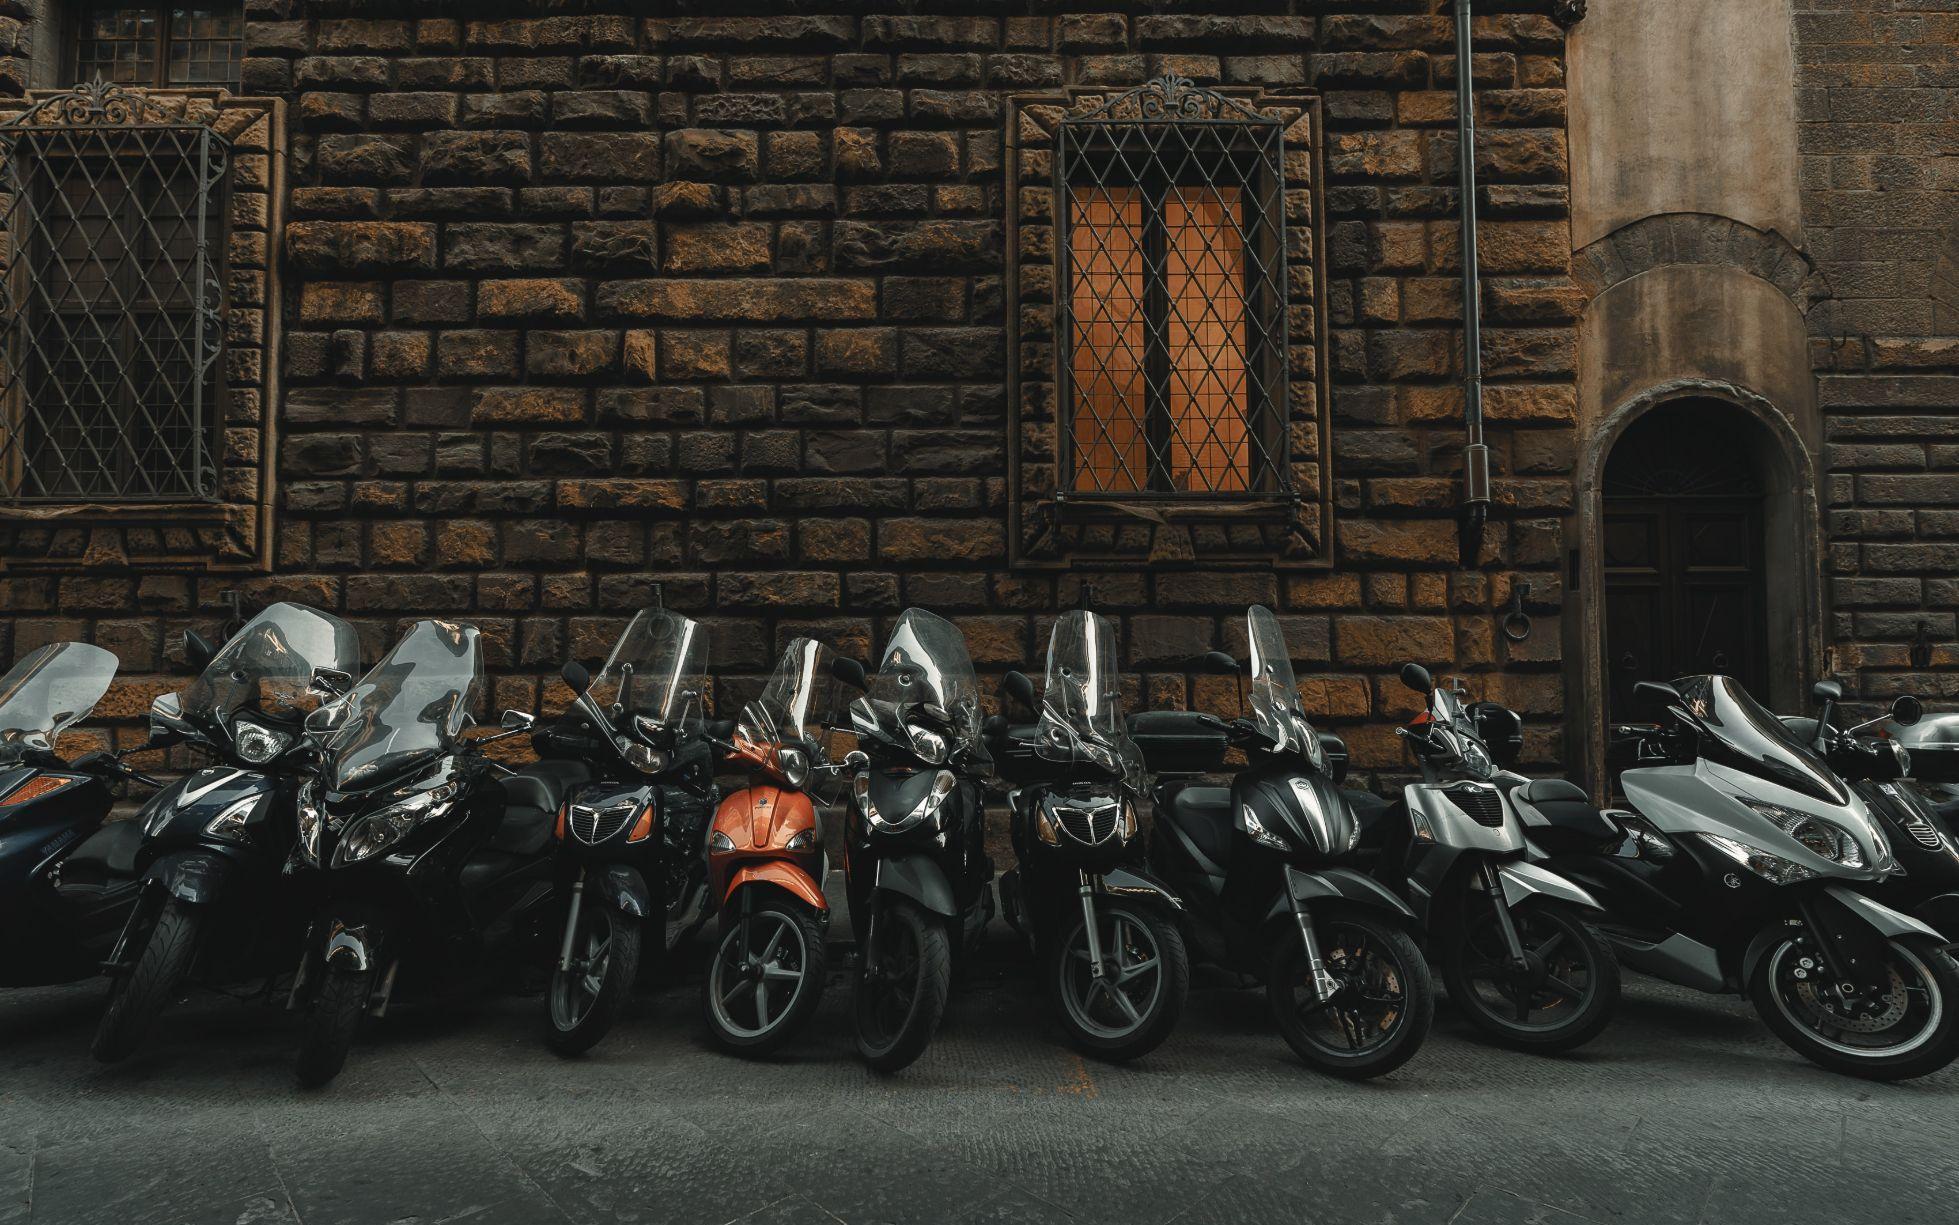 Motorcycle fleet 2